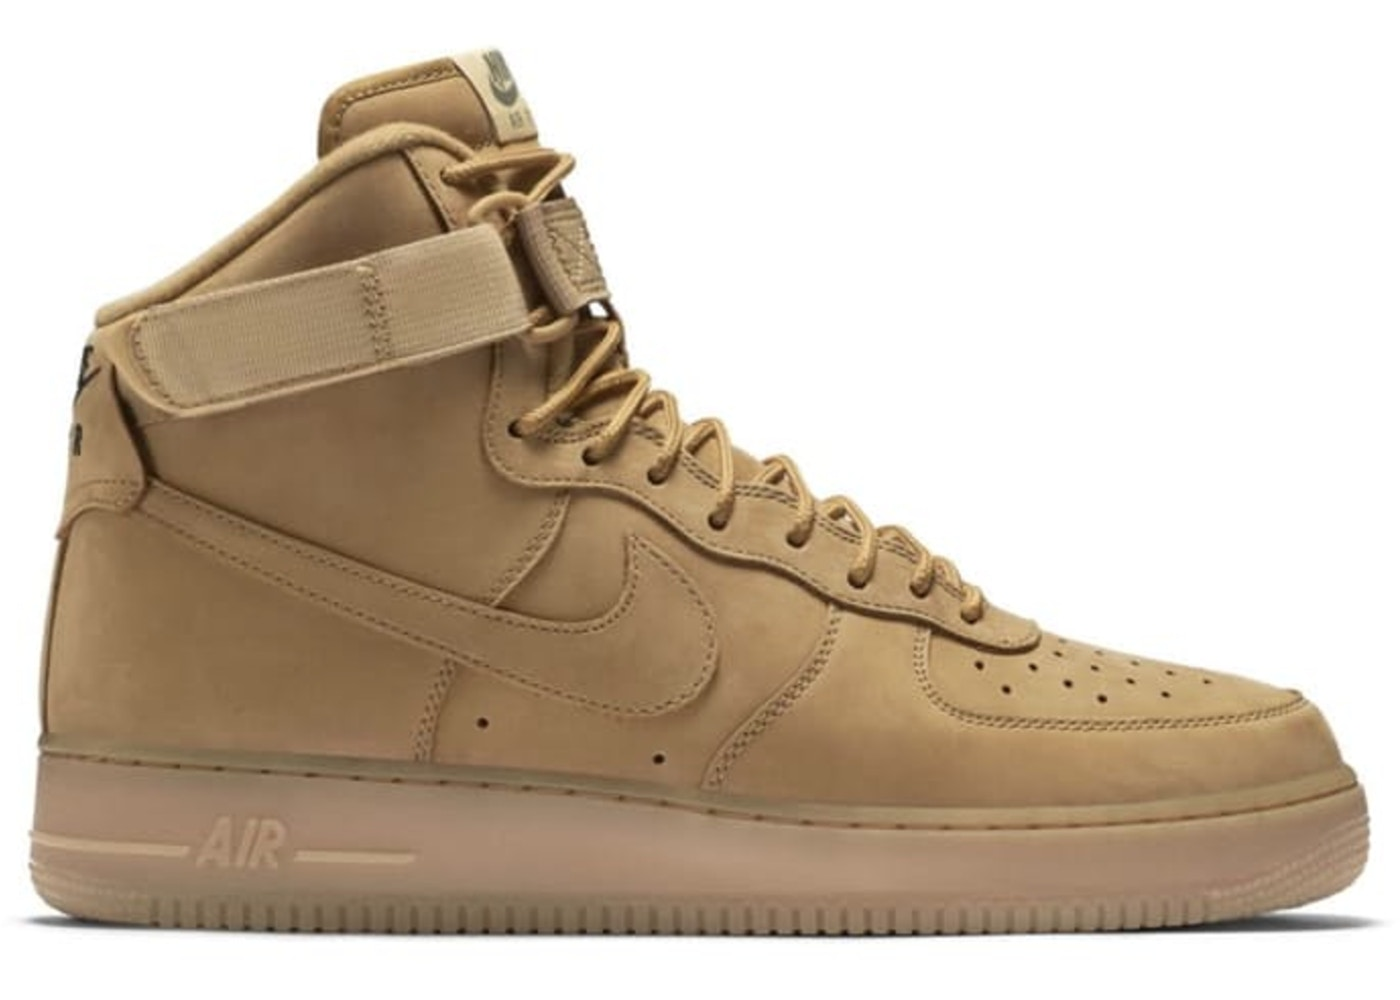 Nike Air Force 1 High Wheat (2016)